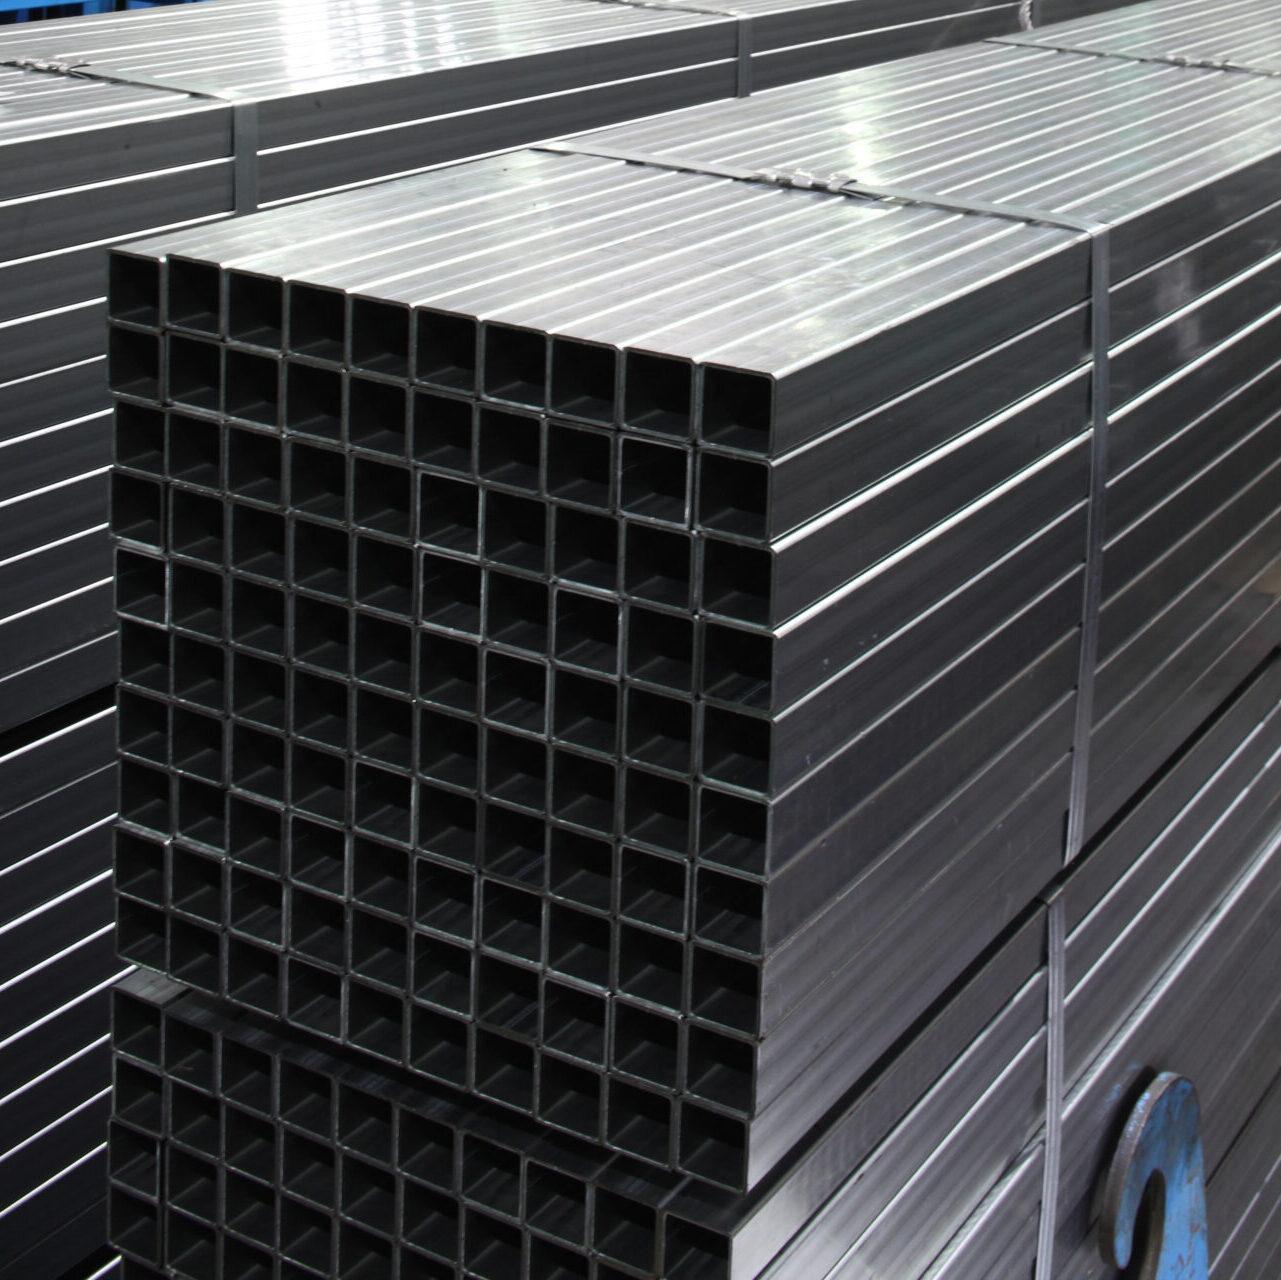 STKMR 機械構造用角形鋼管(スモール角パイプ)正方形